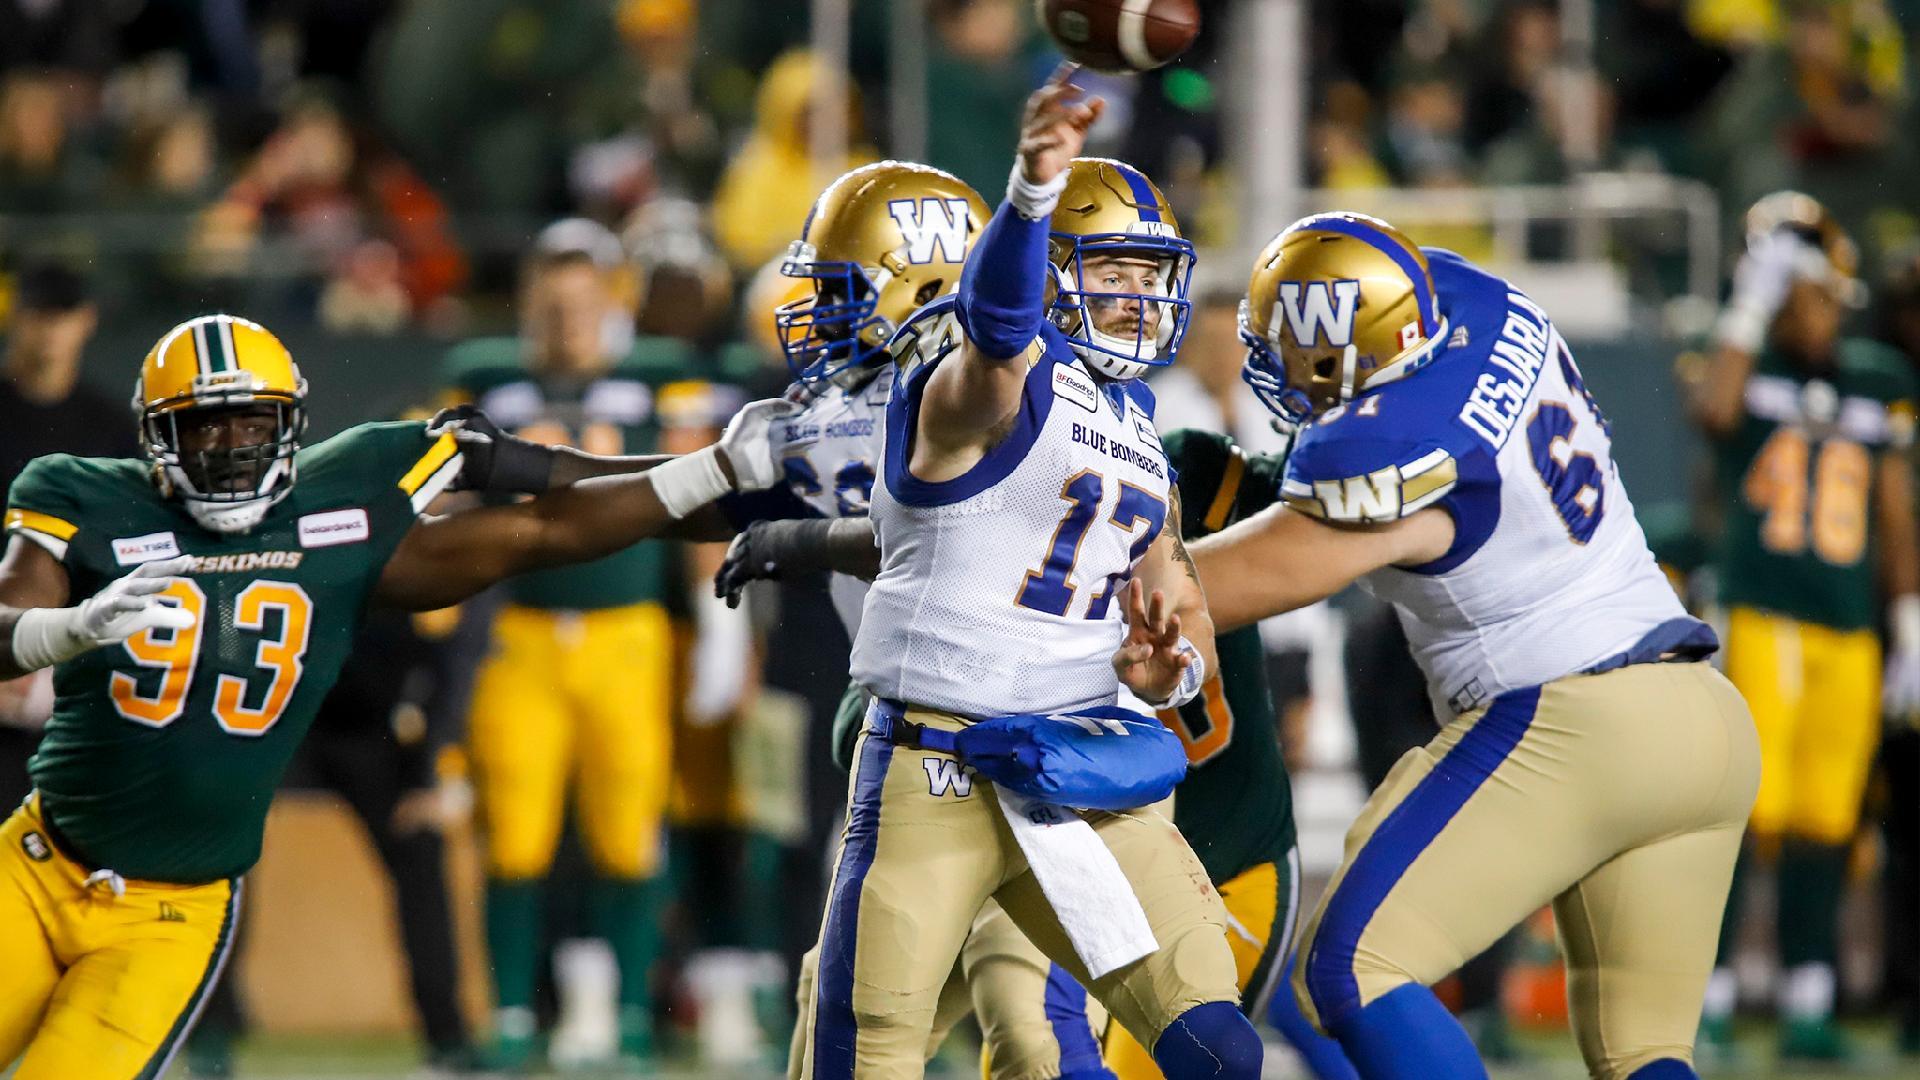 Week 11 Highlights | Winnipeg 34, Edmonton 28 - Winnipeg Blue Bombers